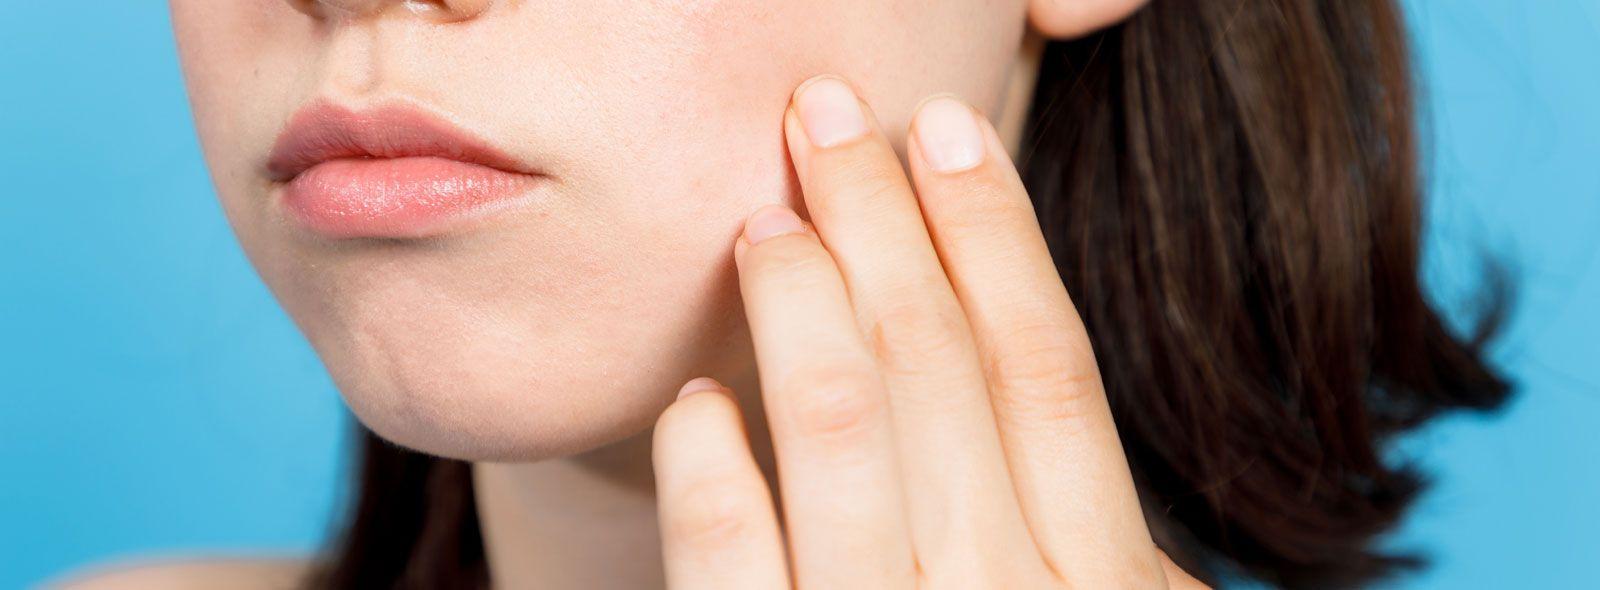 Macchie acne